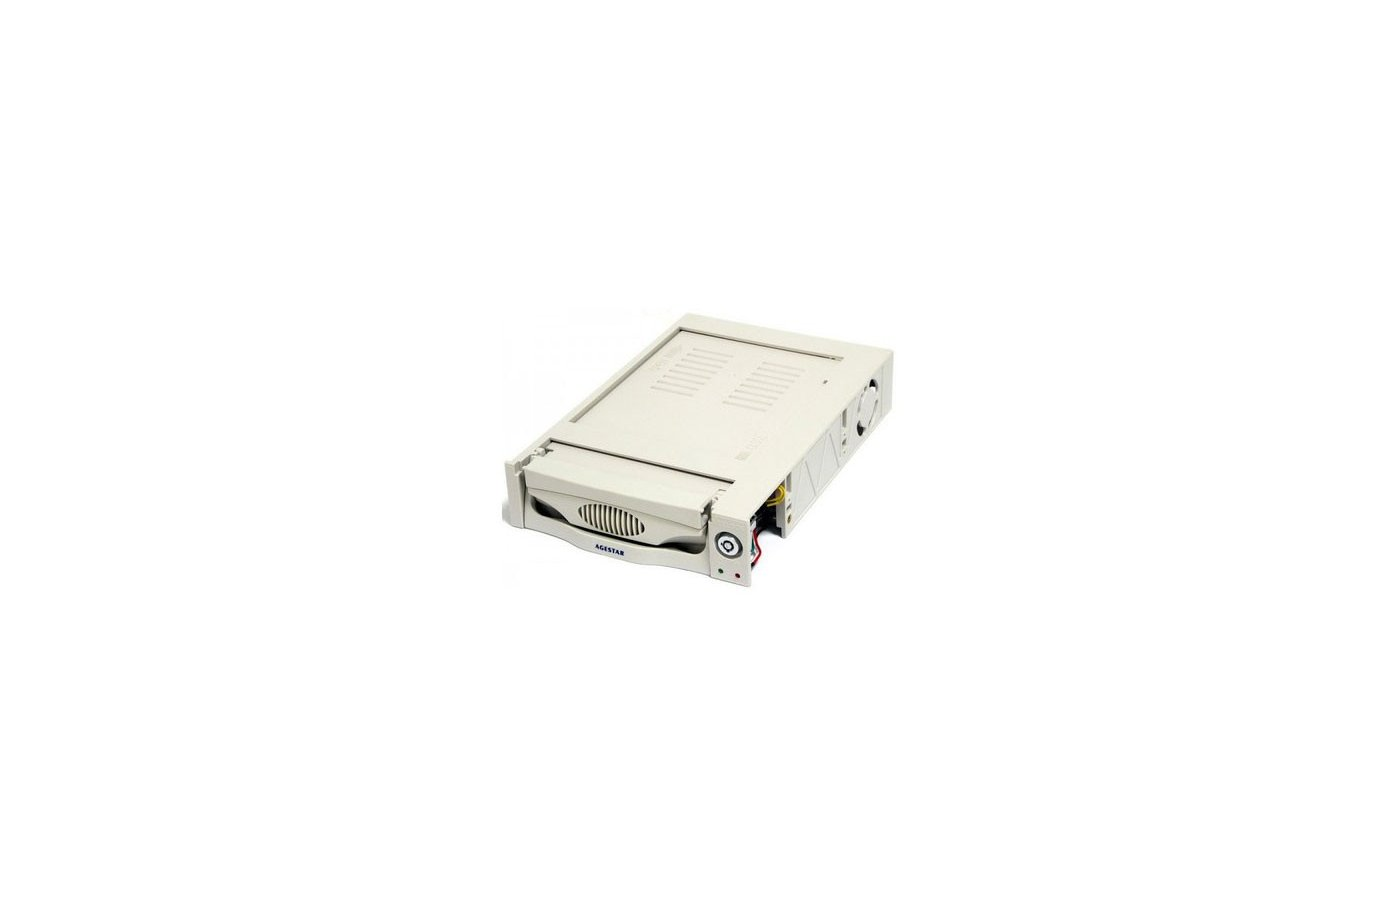 Корпус для жесткого диска AgeStar Сменный бокс для HDD MR3-SATA(S)-1F SATA II пластик бежевый